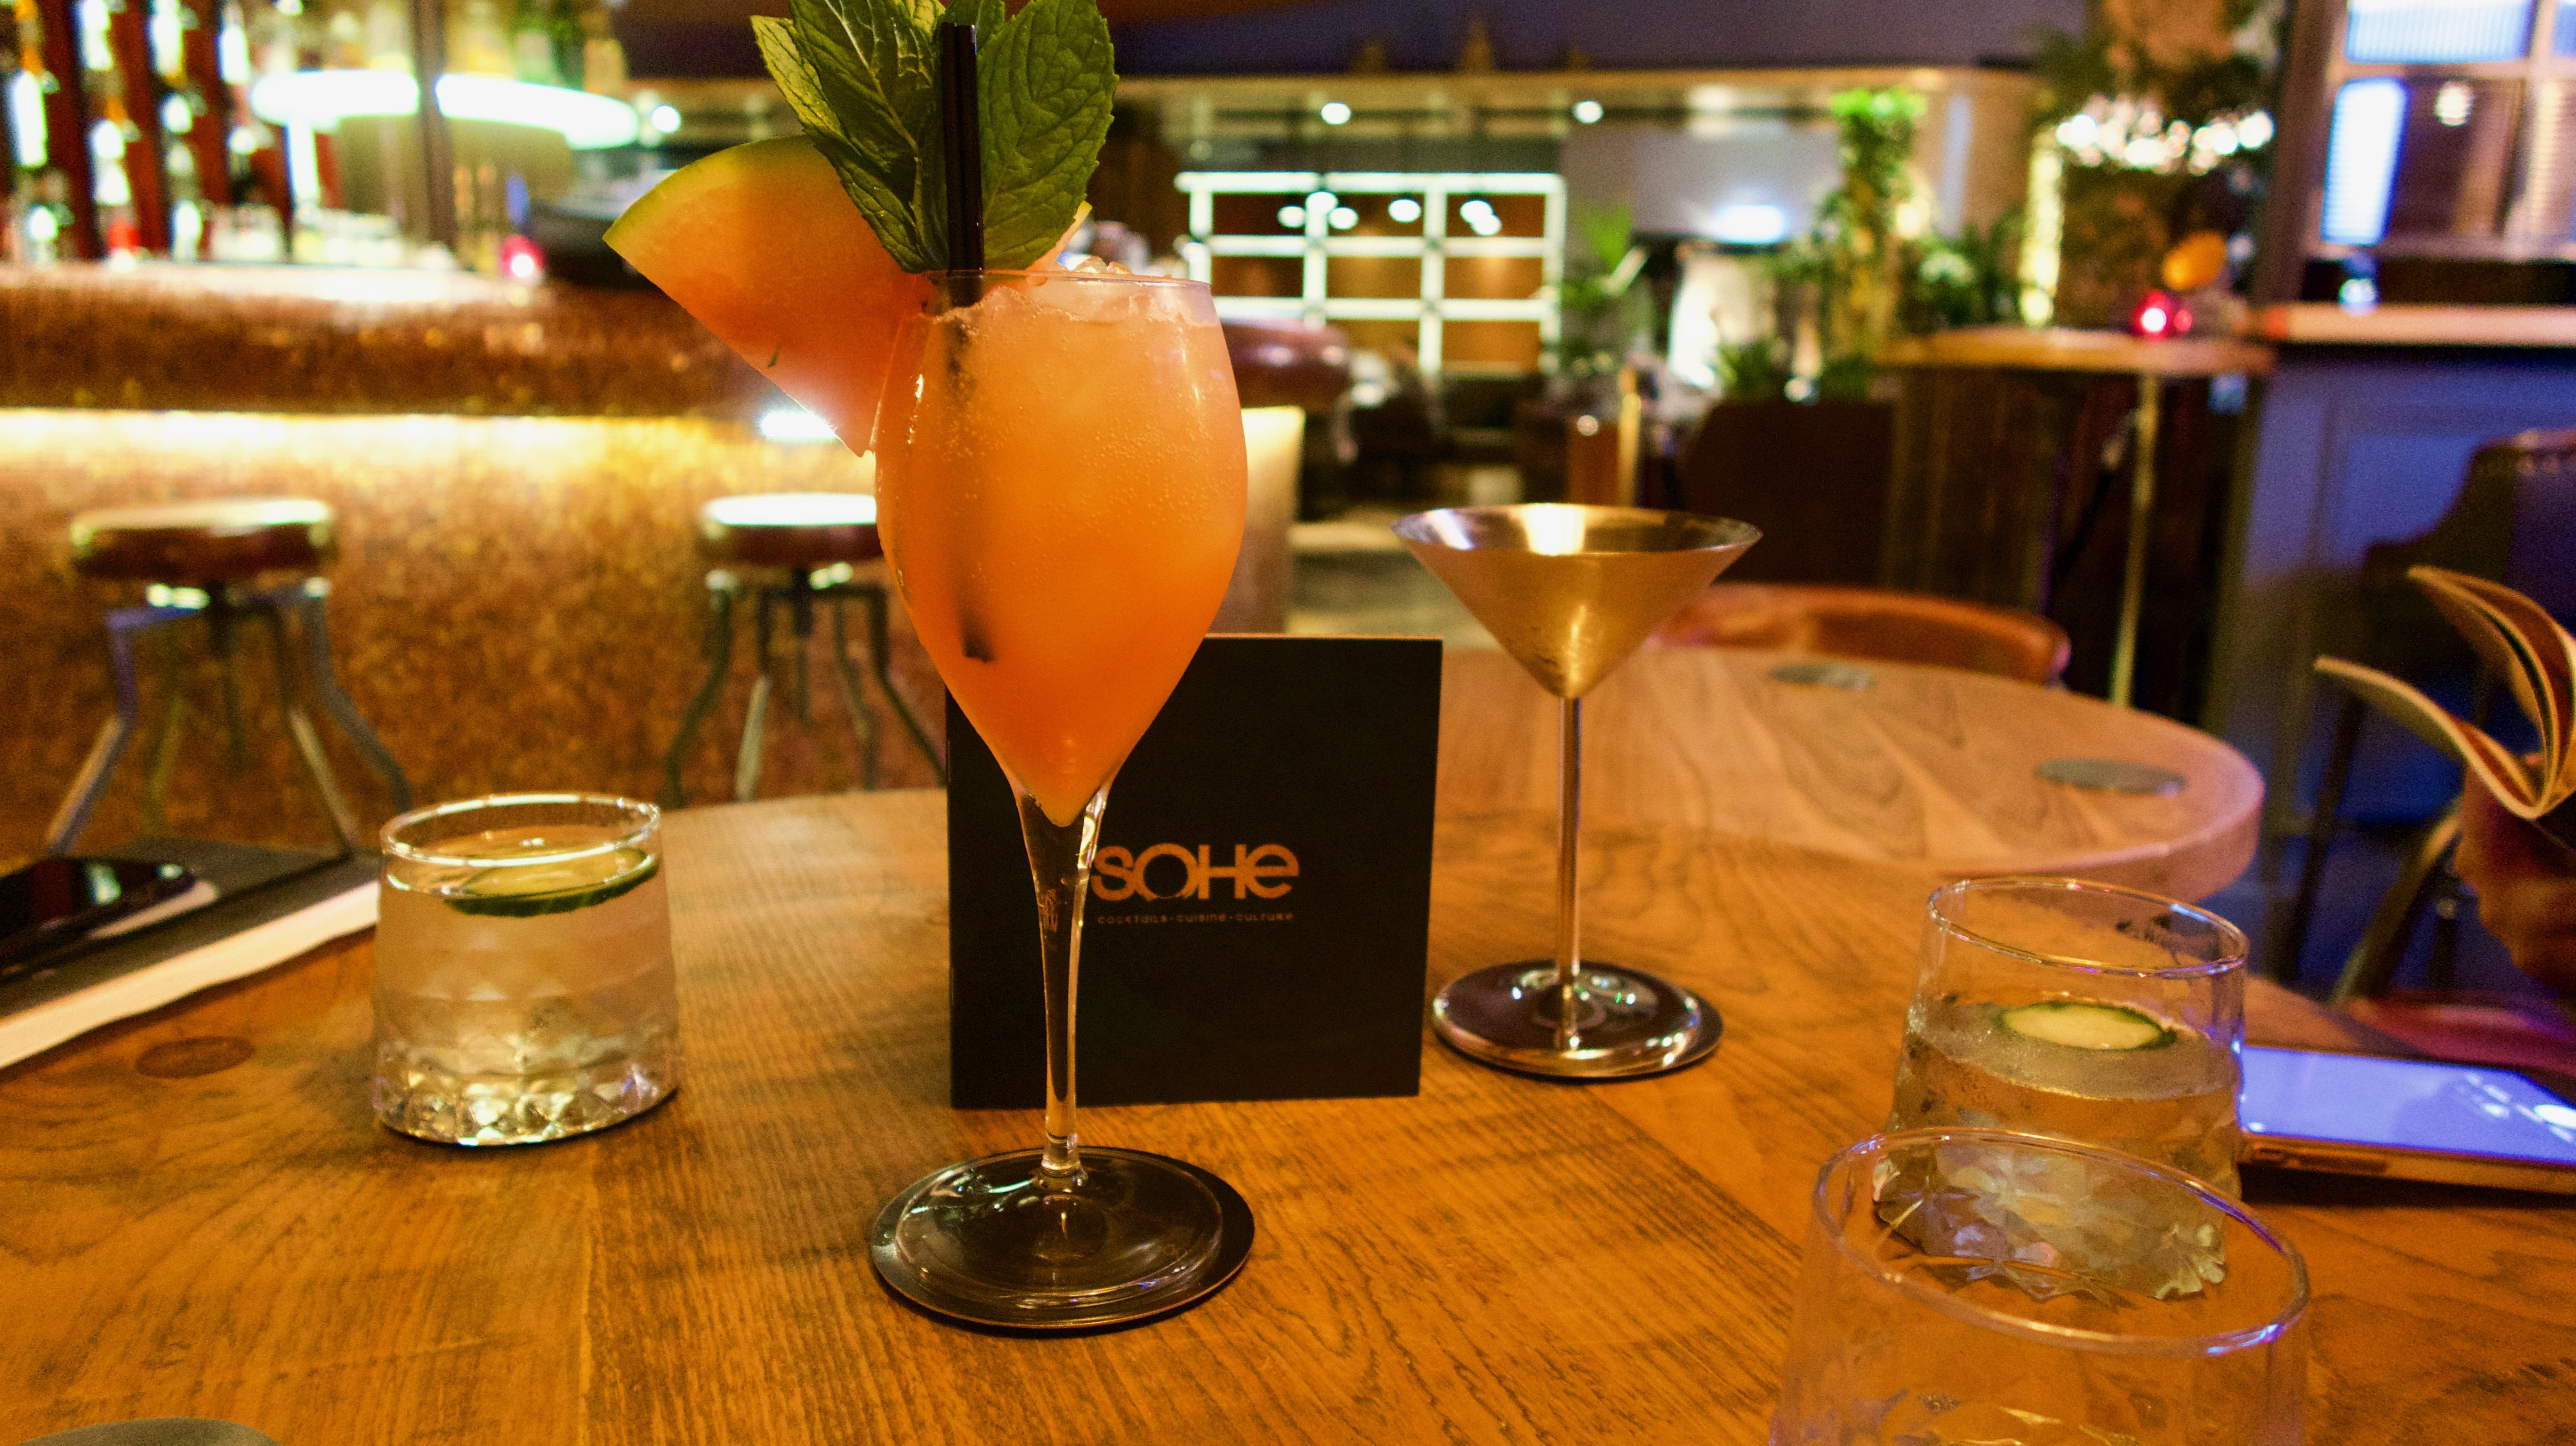 SoHe Jesmond Cocktail Lounge Relaunch 3